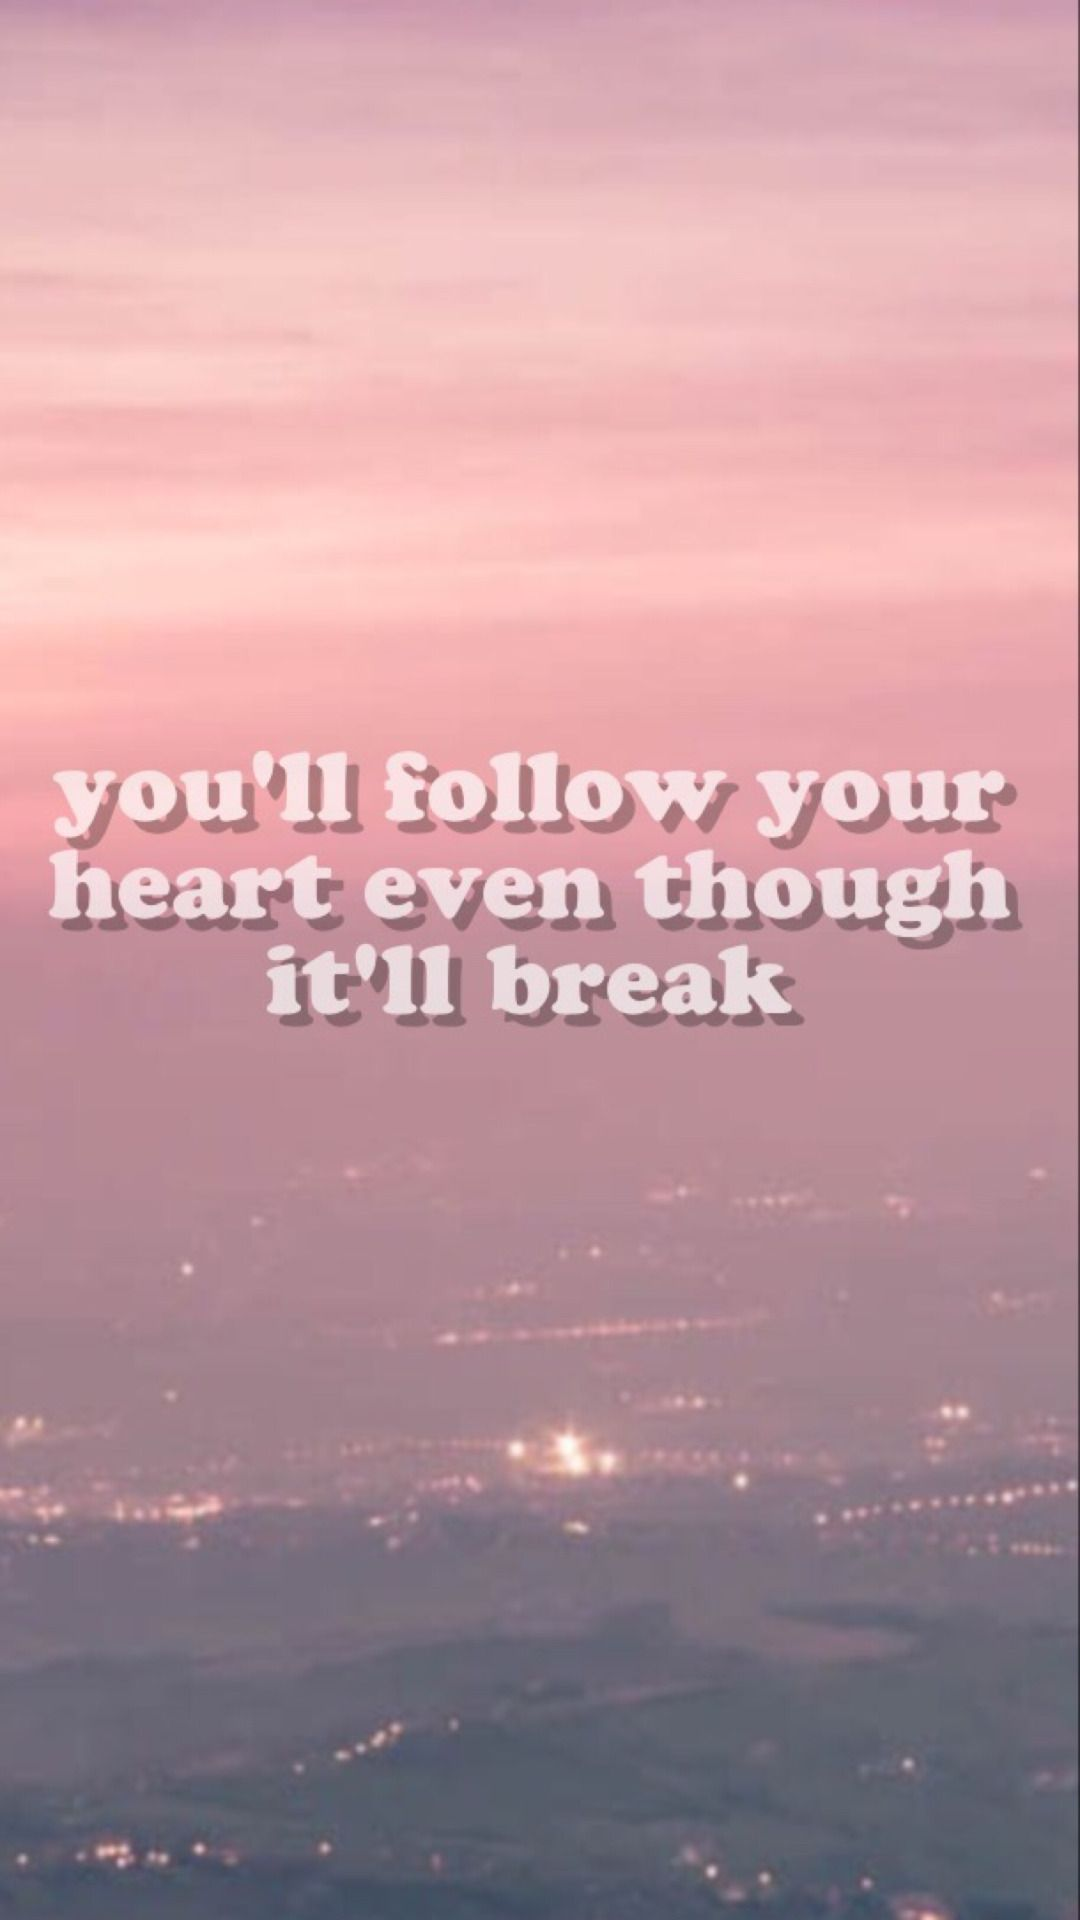 Wallpaper One Direction Tumblr Lyrics Aesthetic One Direction Lyrics Song Lyrics Wallpaper